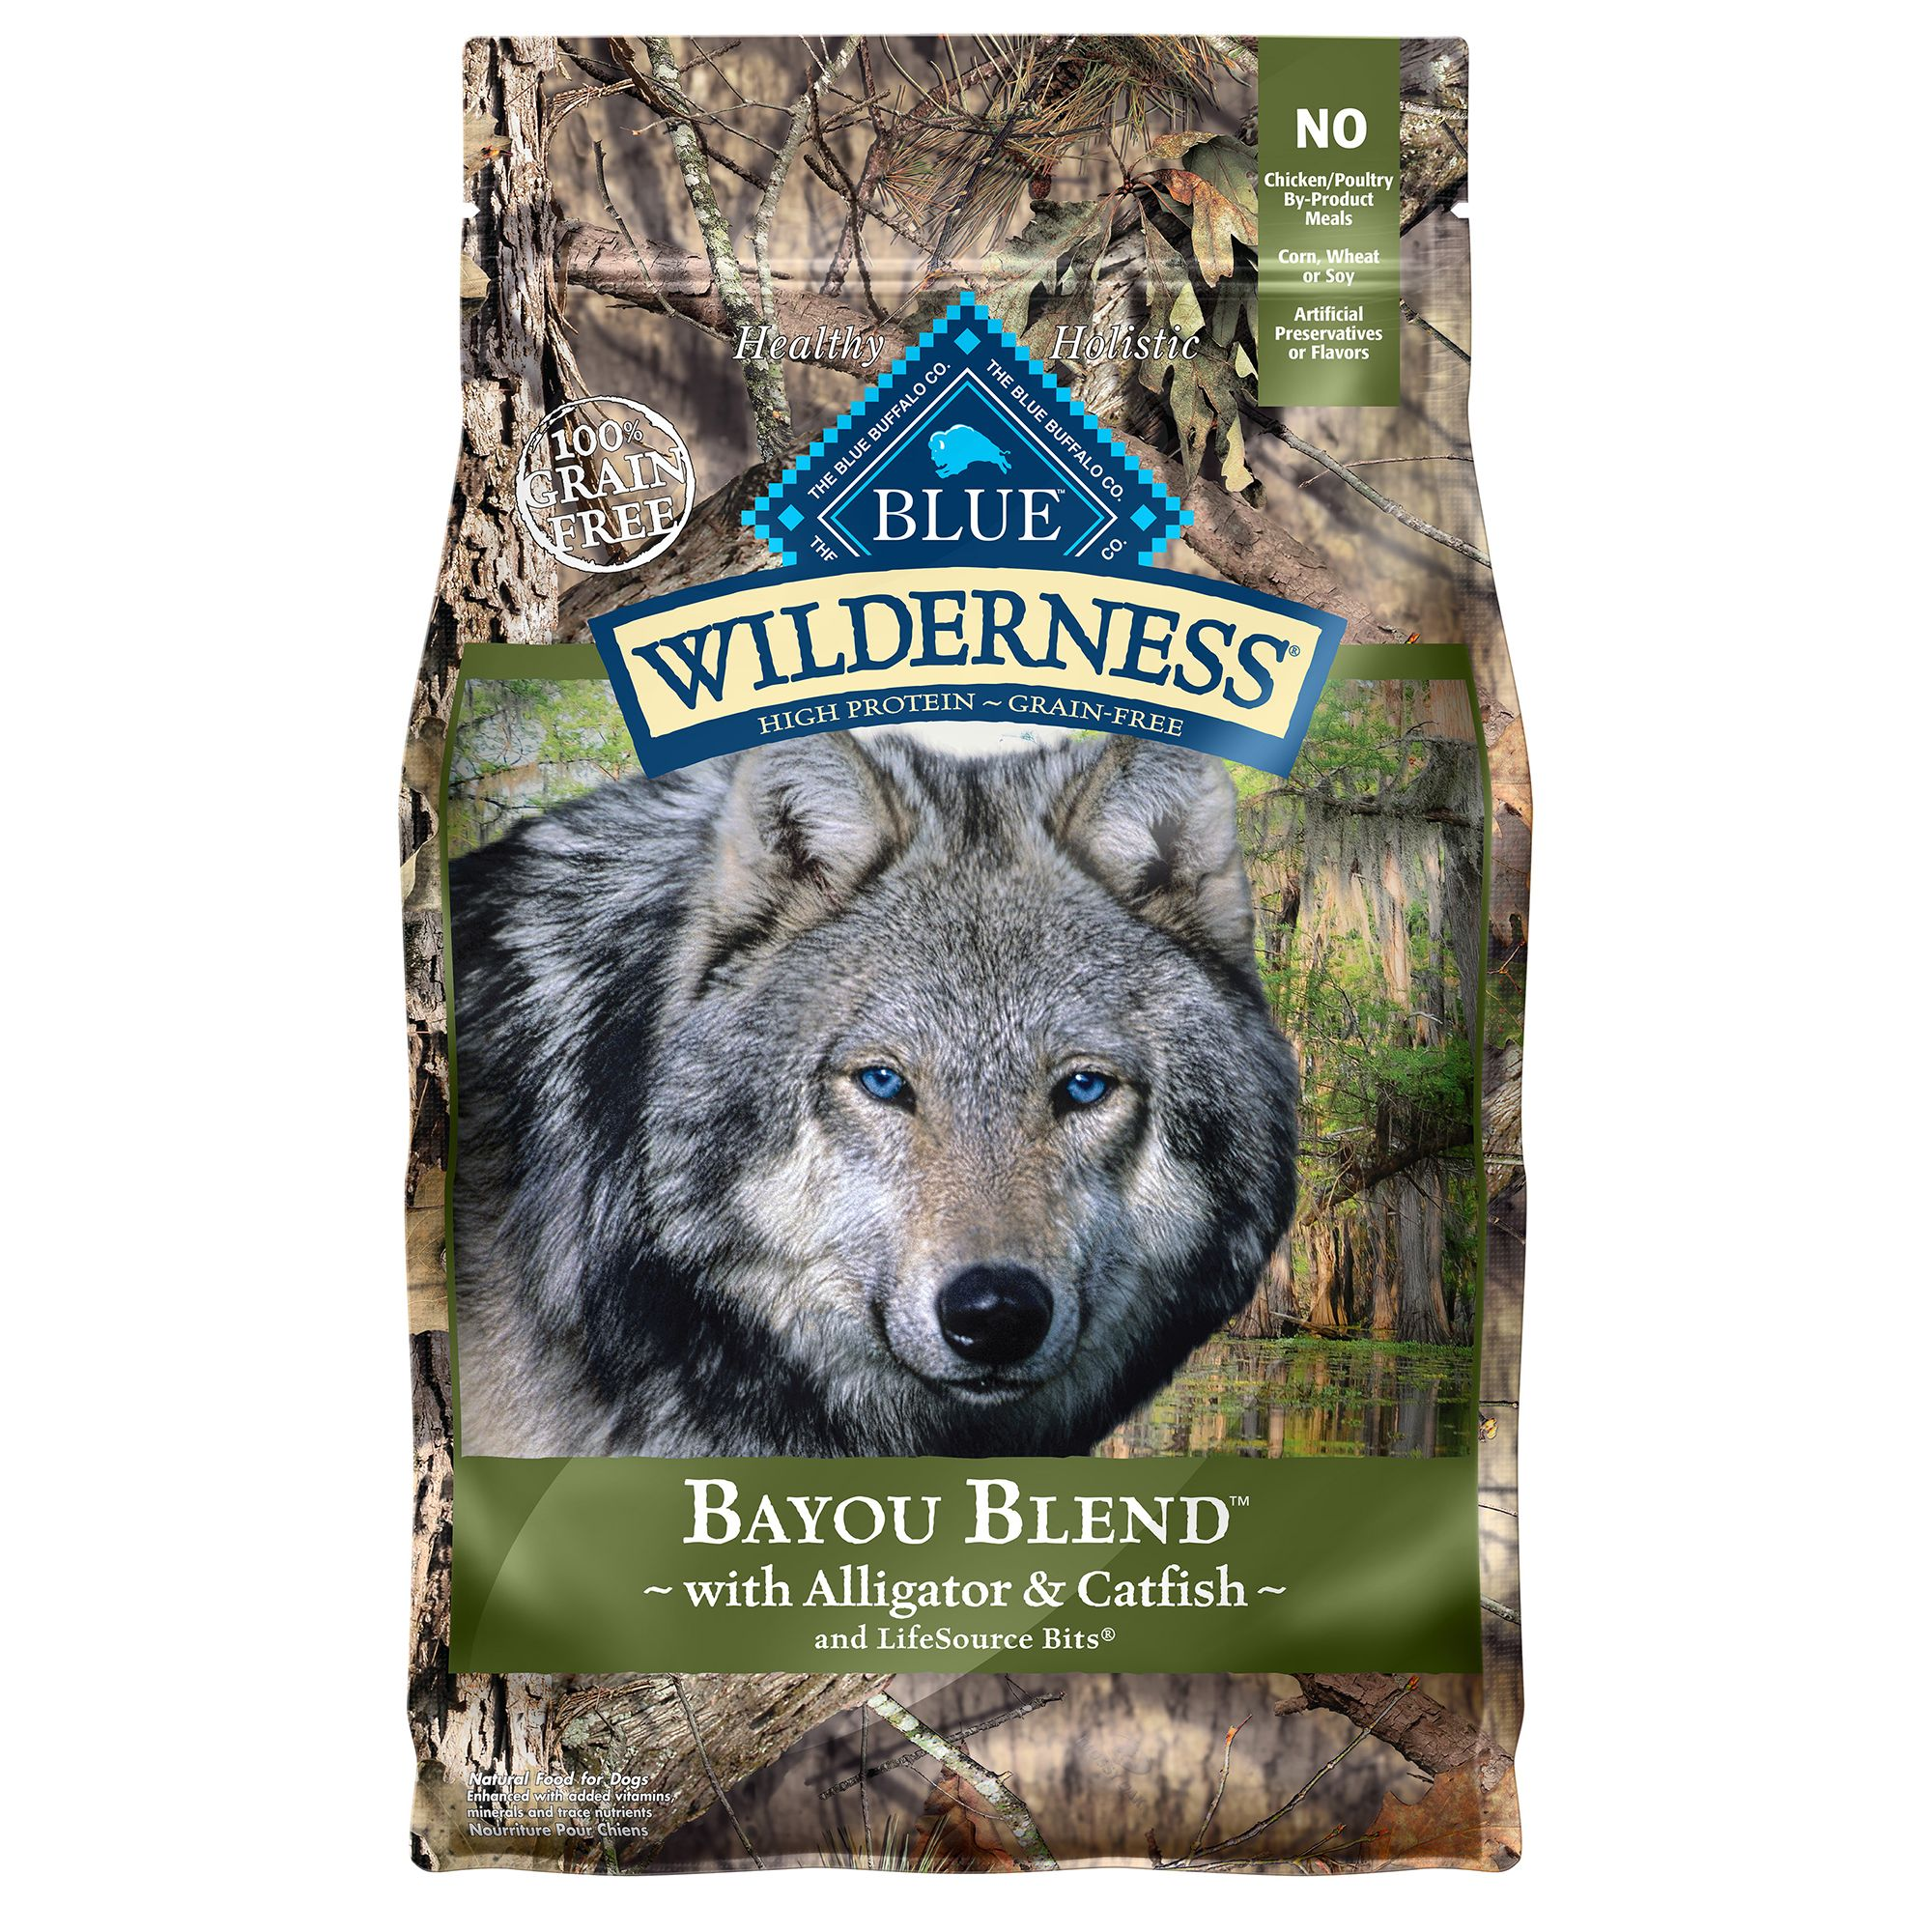 Blue Wilderness® Bayou Blend Dog Food - Grain Free, Gluten Free, Alligator and Catfish size: 4 Lb 5247757